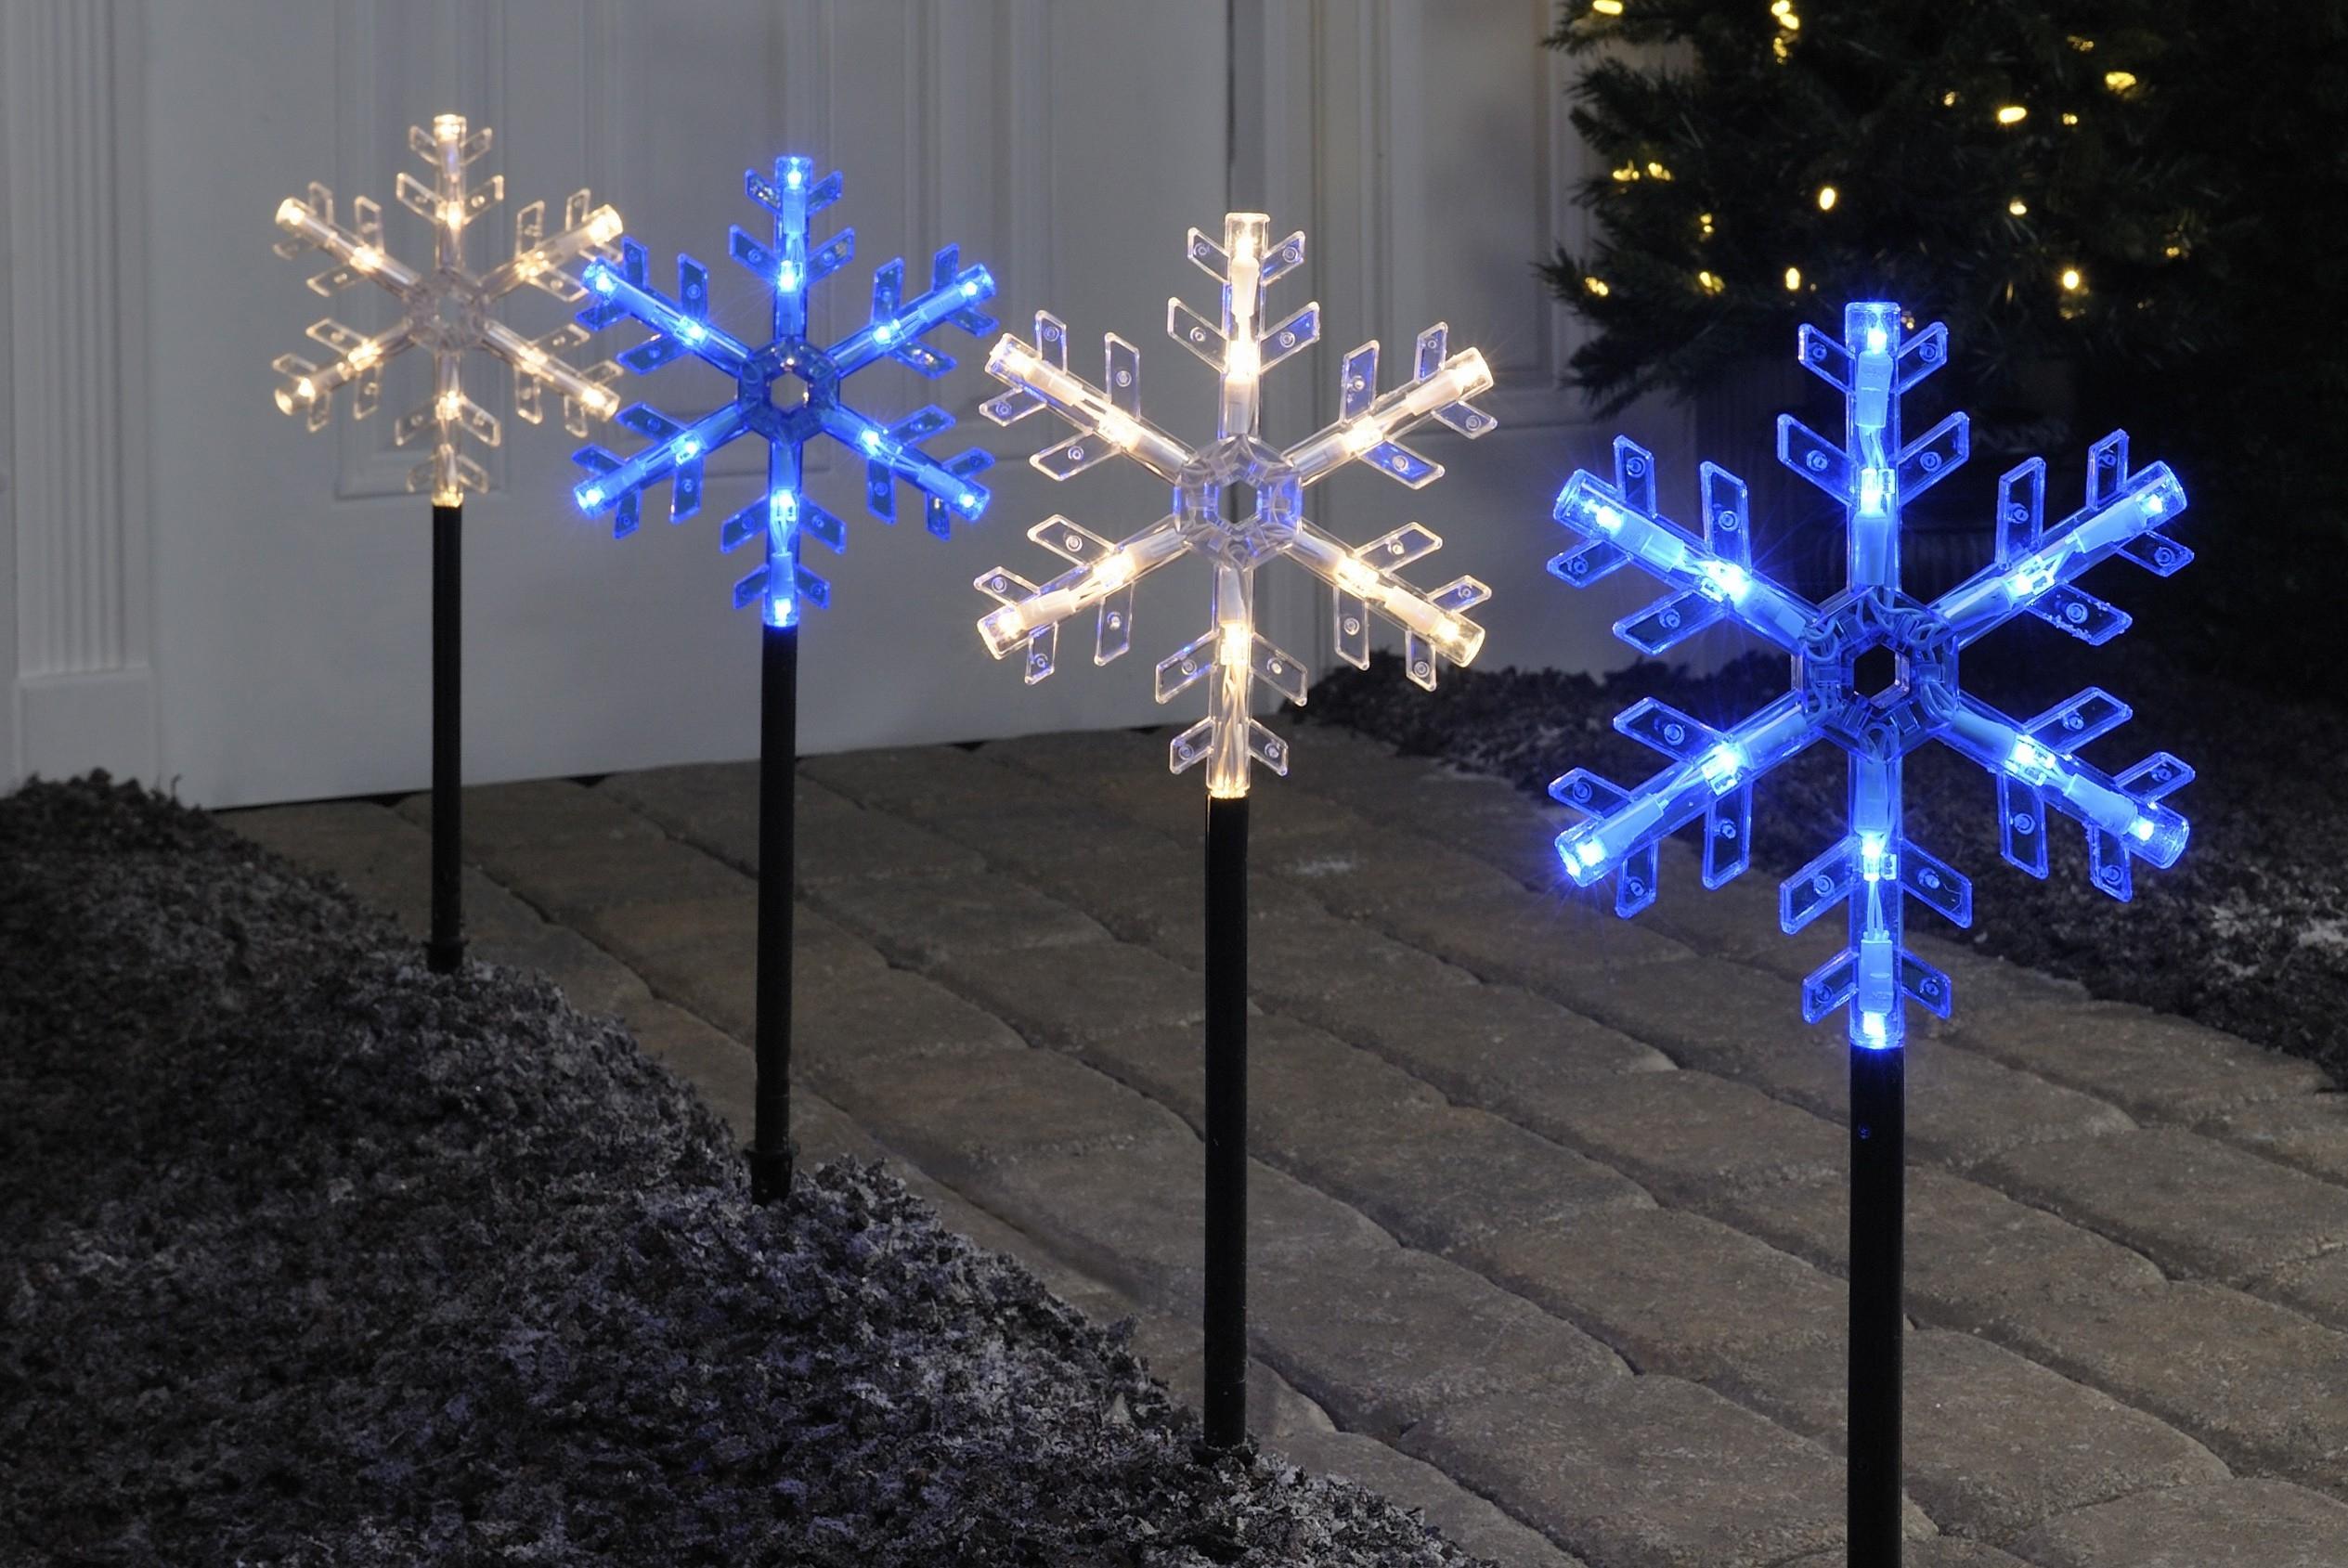 50 Outdoor Tree Lights Solar You Ll Love In 2020 Visual Hunt